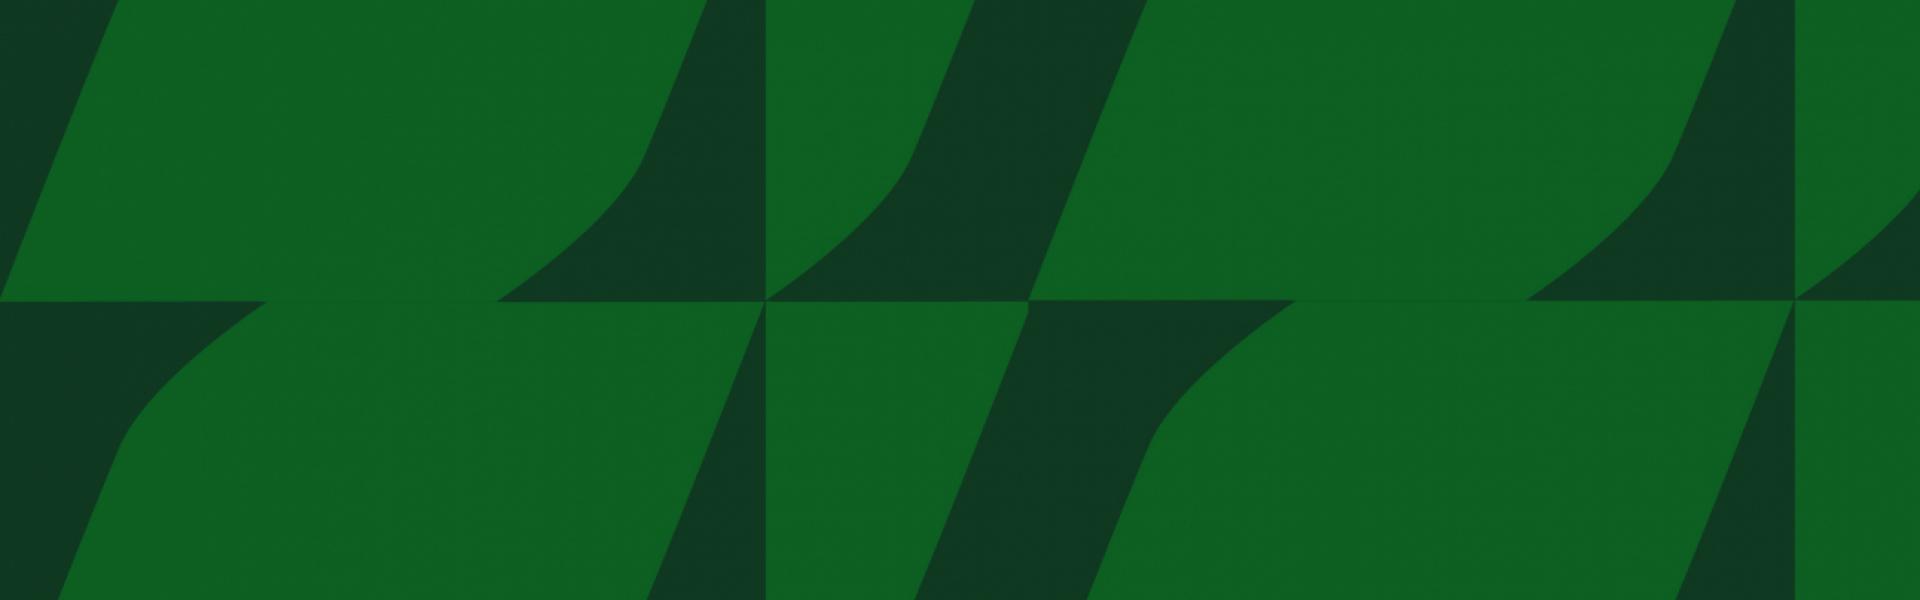 banner_3Artboard-4-100.20210518132614.jpg